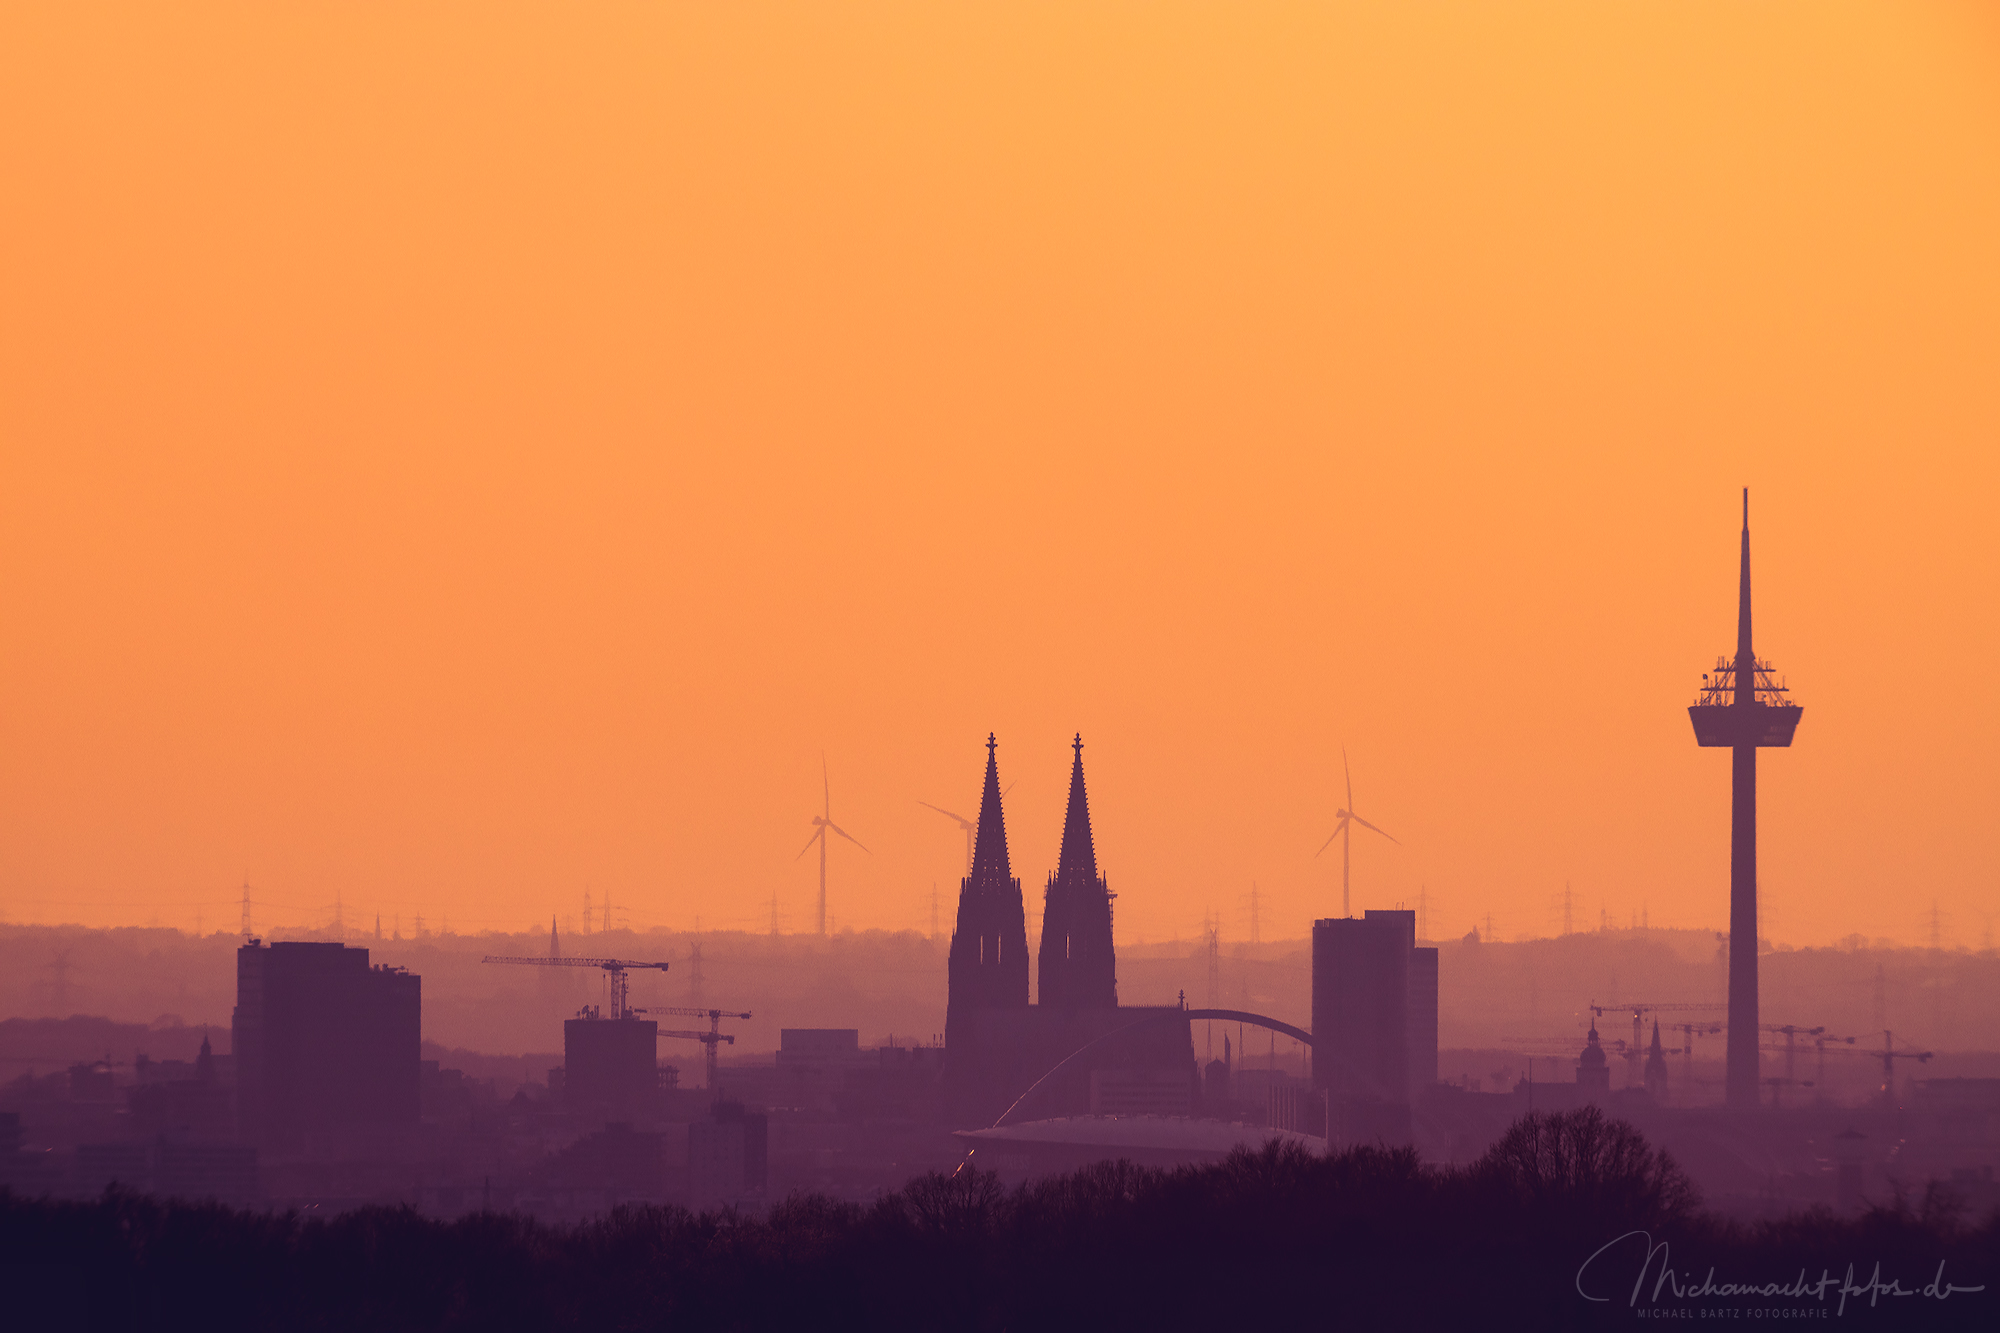 Skyline von Köln im Frühjahr, Germany